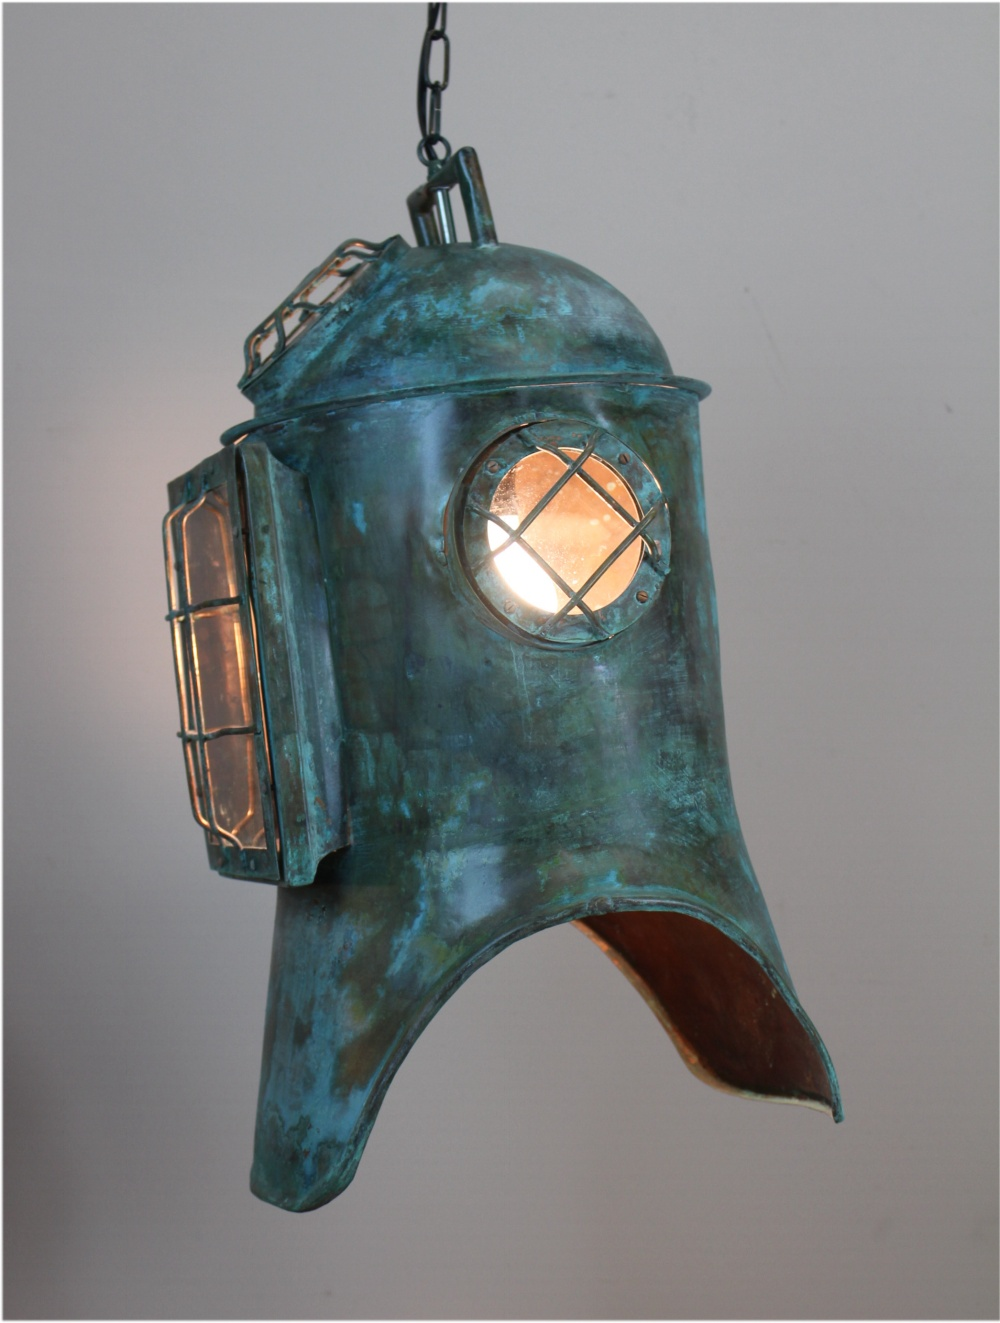 Antique Replica Divers Helmet Life Size Solid Copper Old Nautical Pendant Light